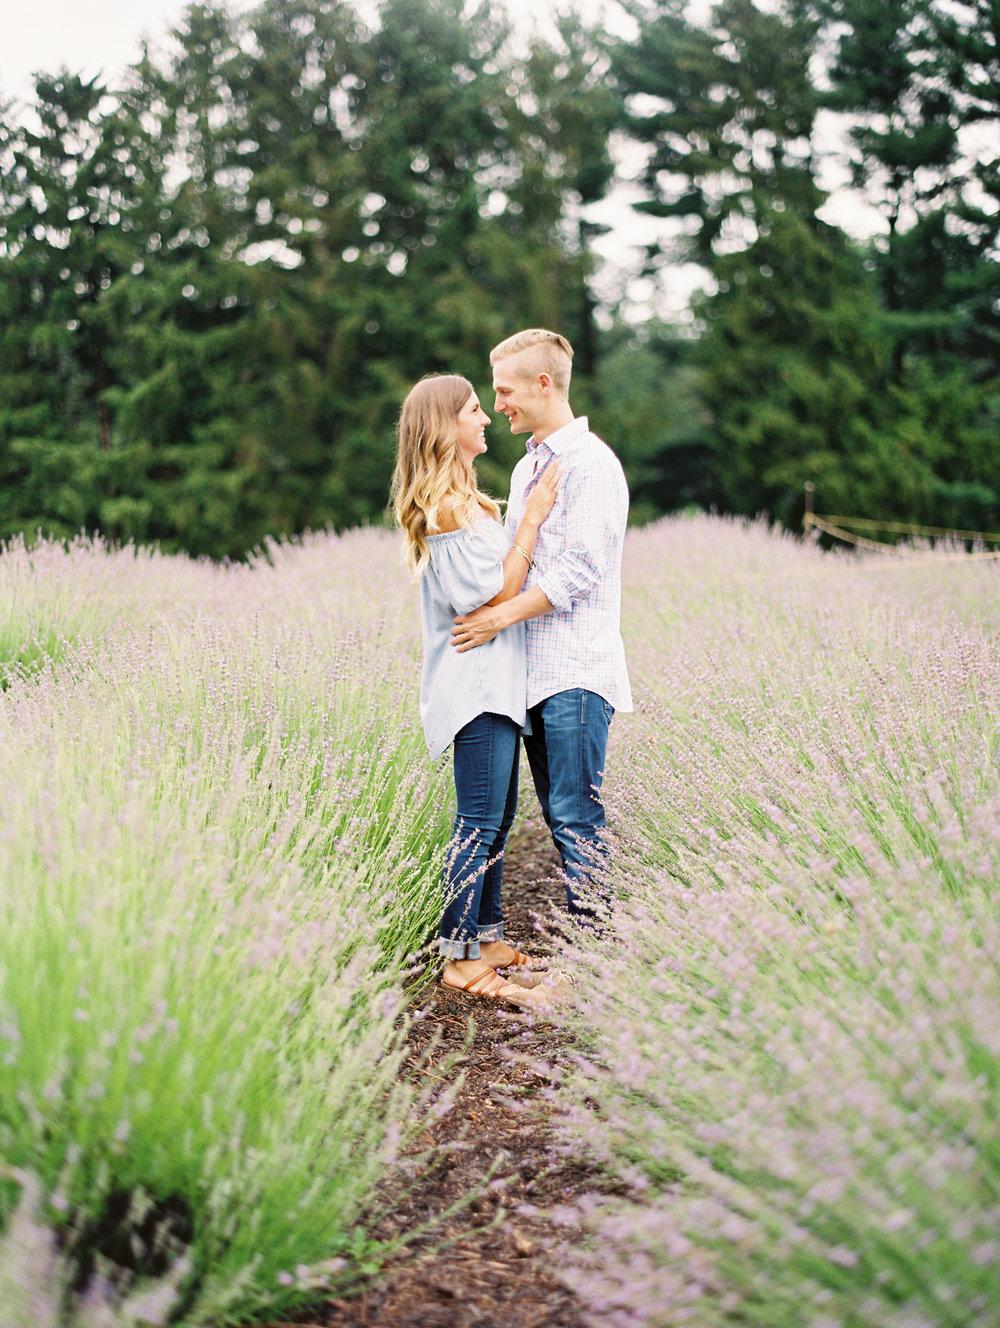 Kerri+Austin+Lavender+Field+Engagement-36.jpg